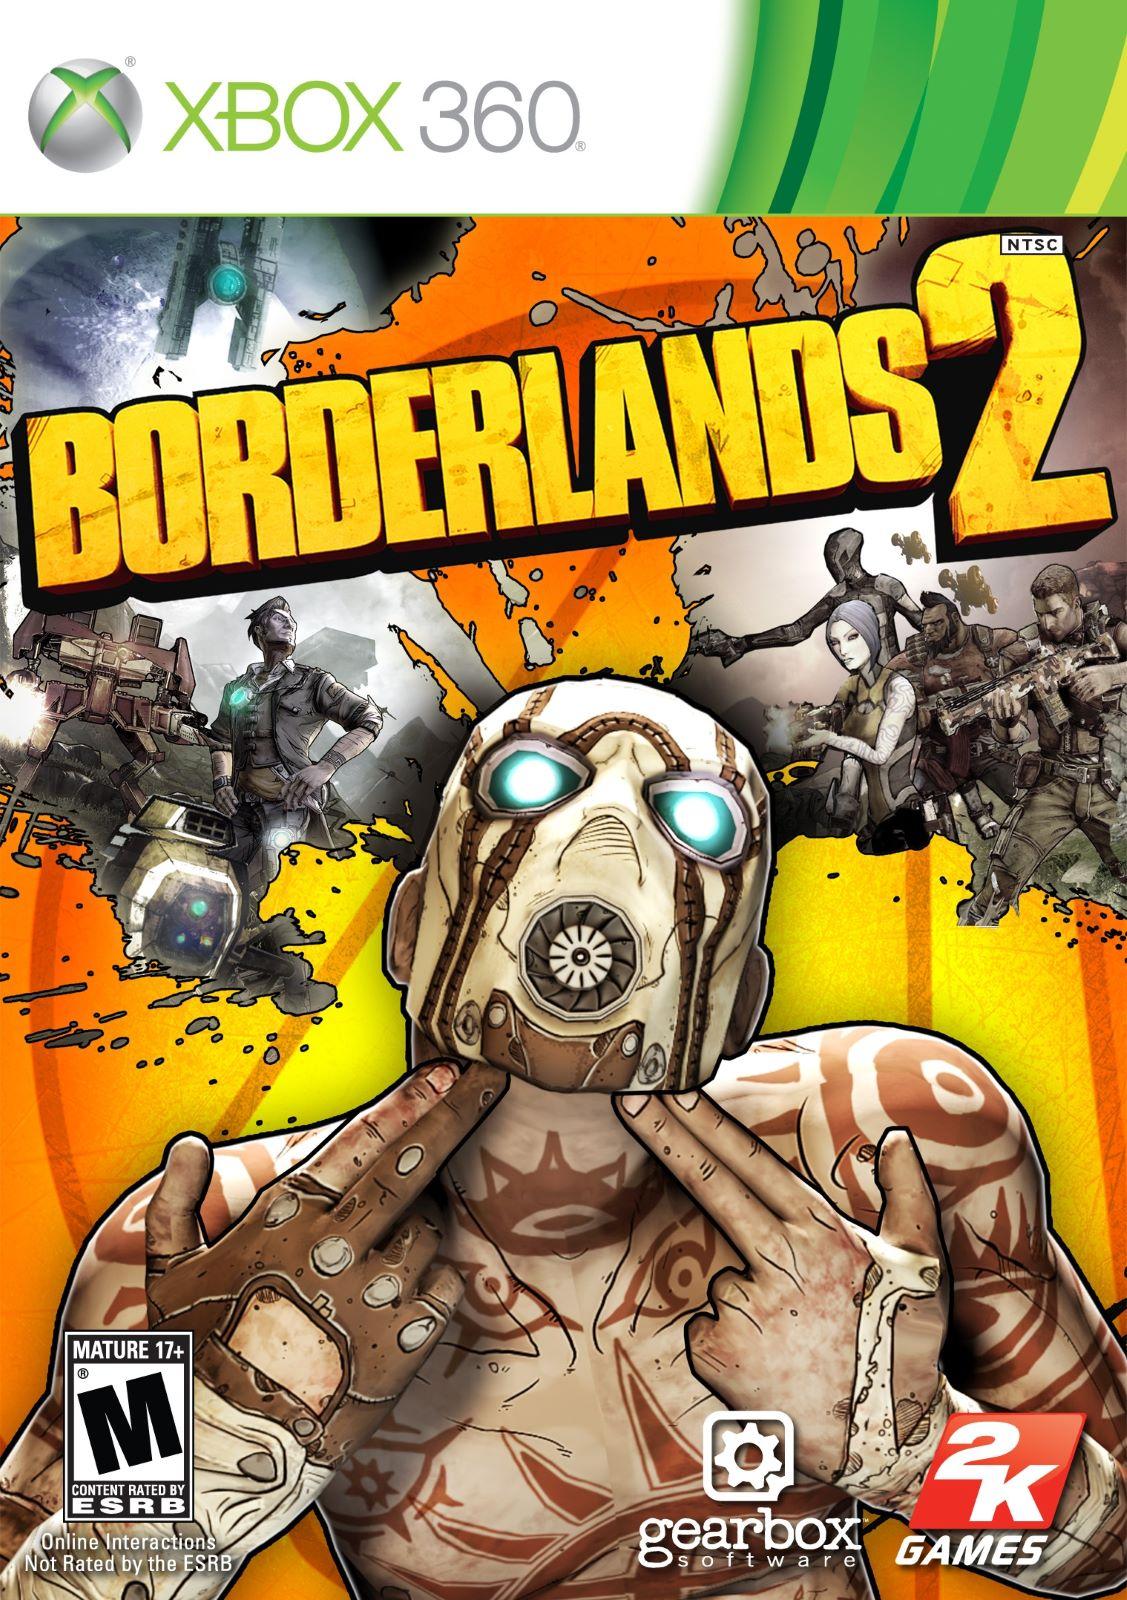 Borderlands 2 Slot Machines Xbox 360